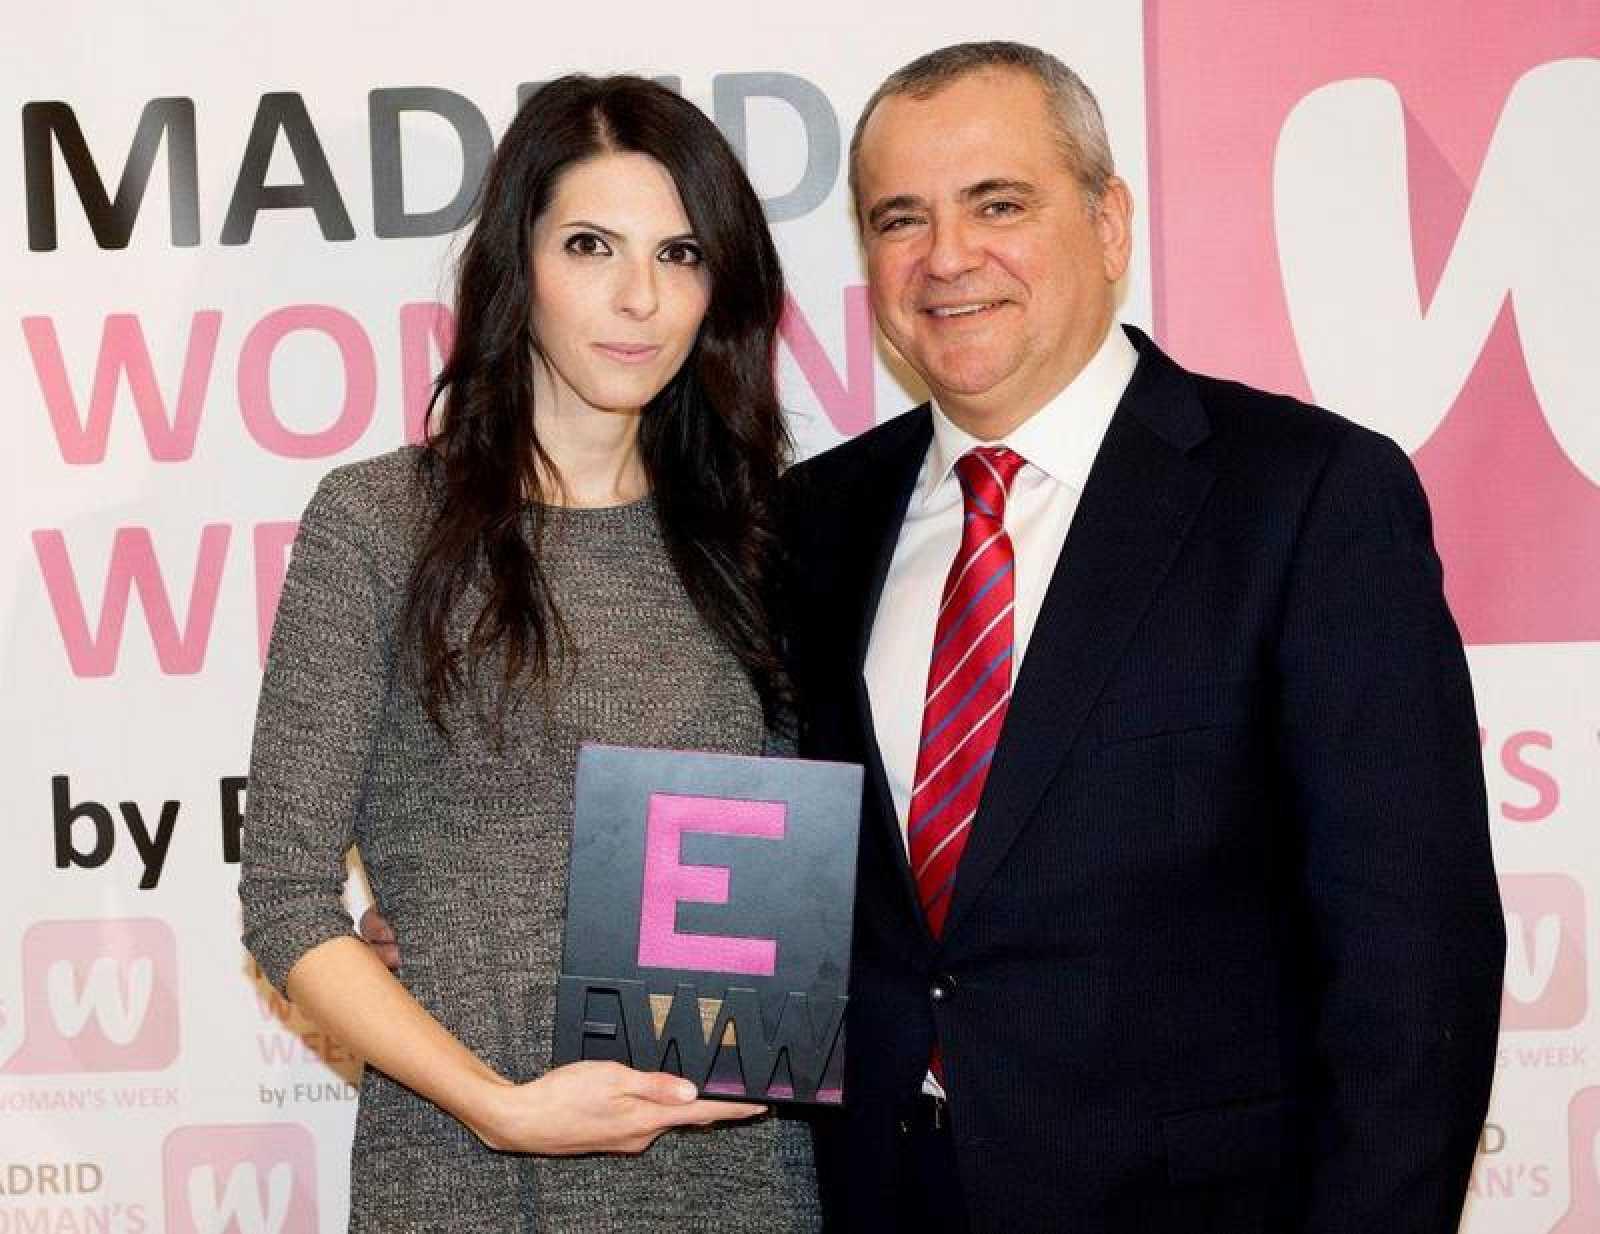 Premio Madrid Woman's Week 2016